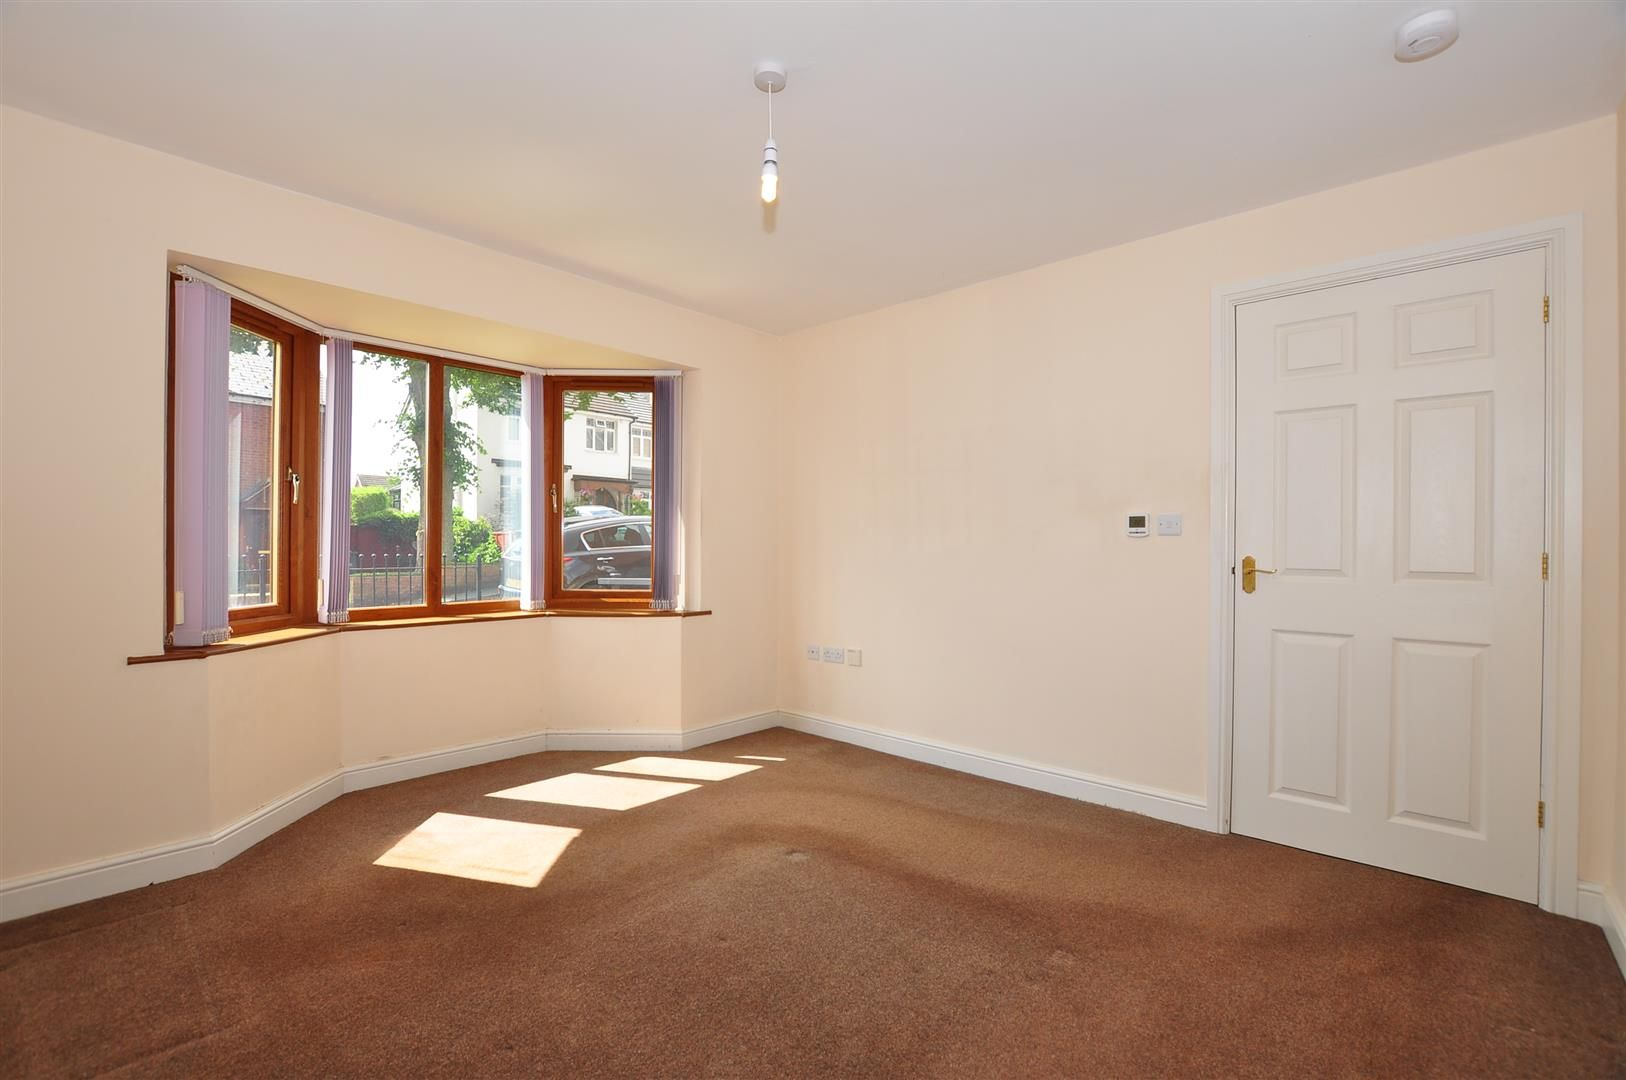 2 bed detached-bungalow for sale 6